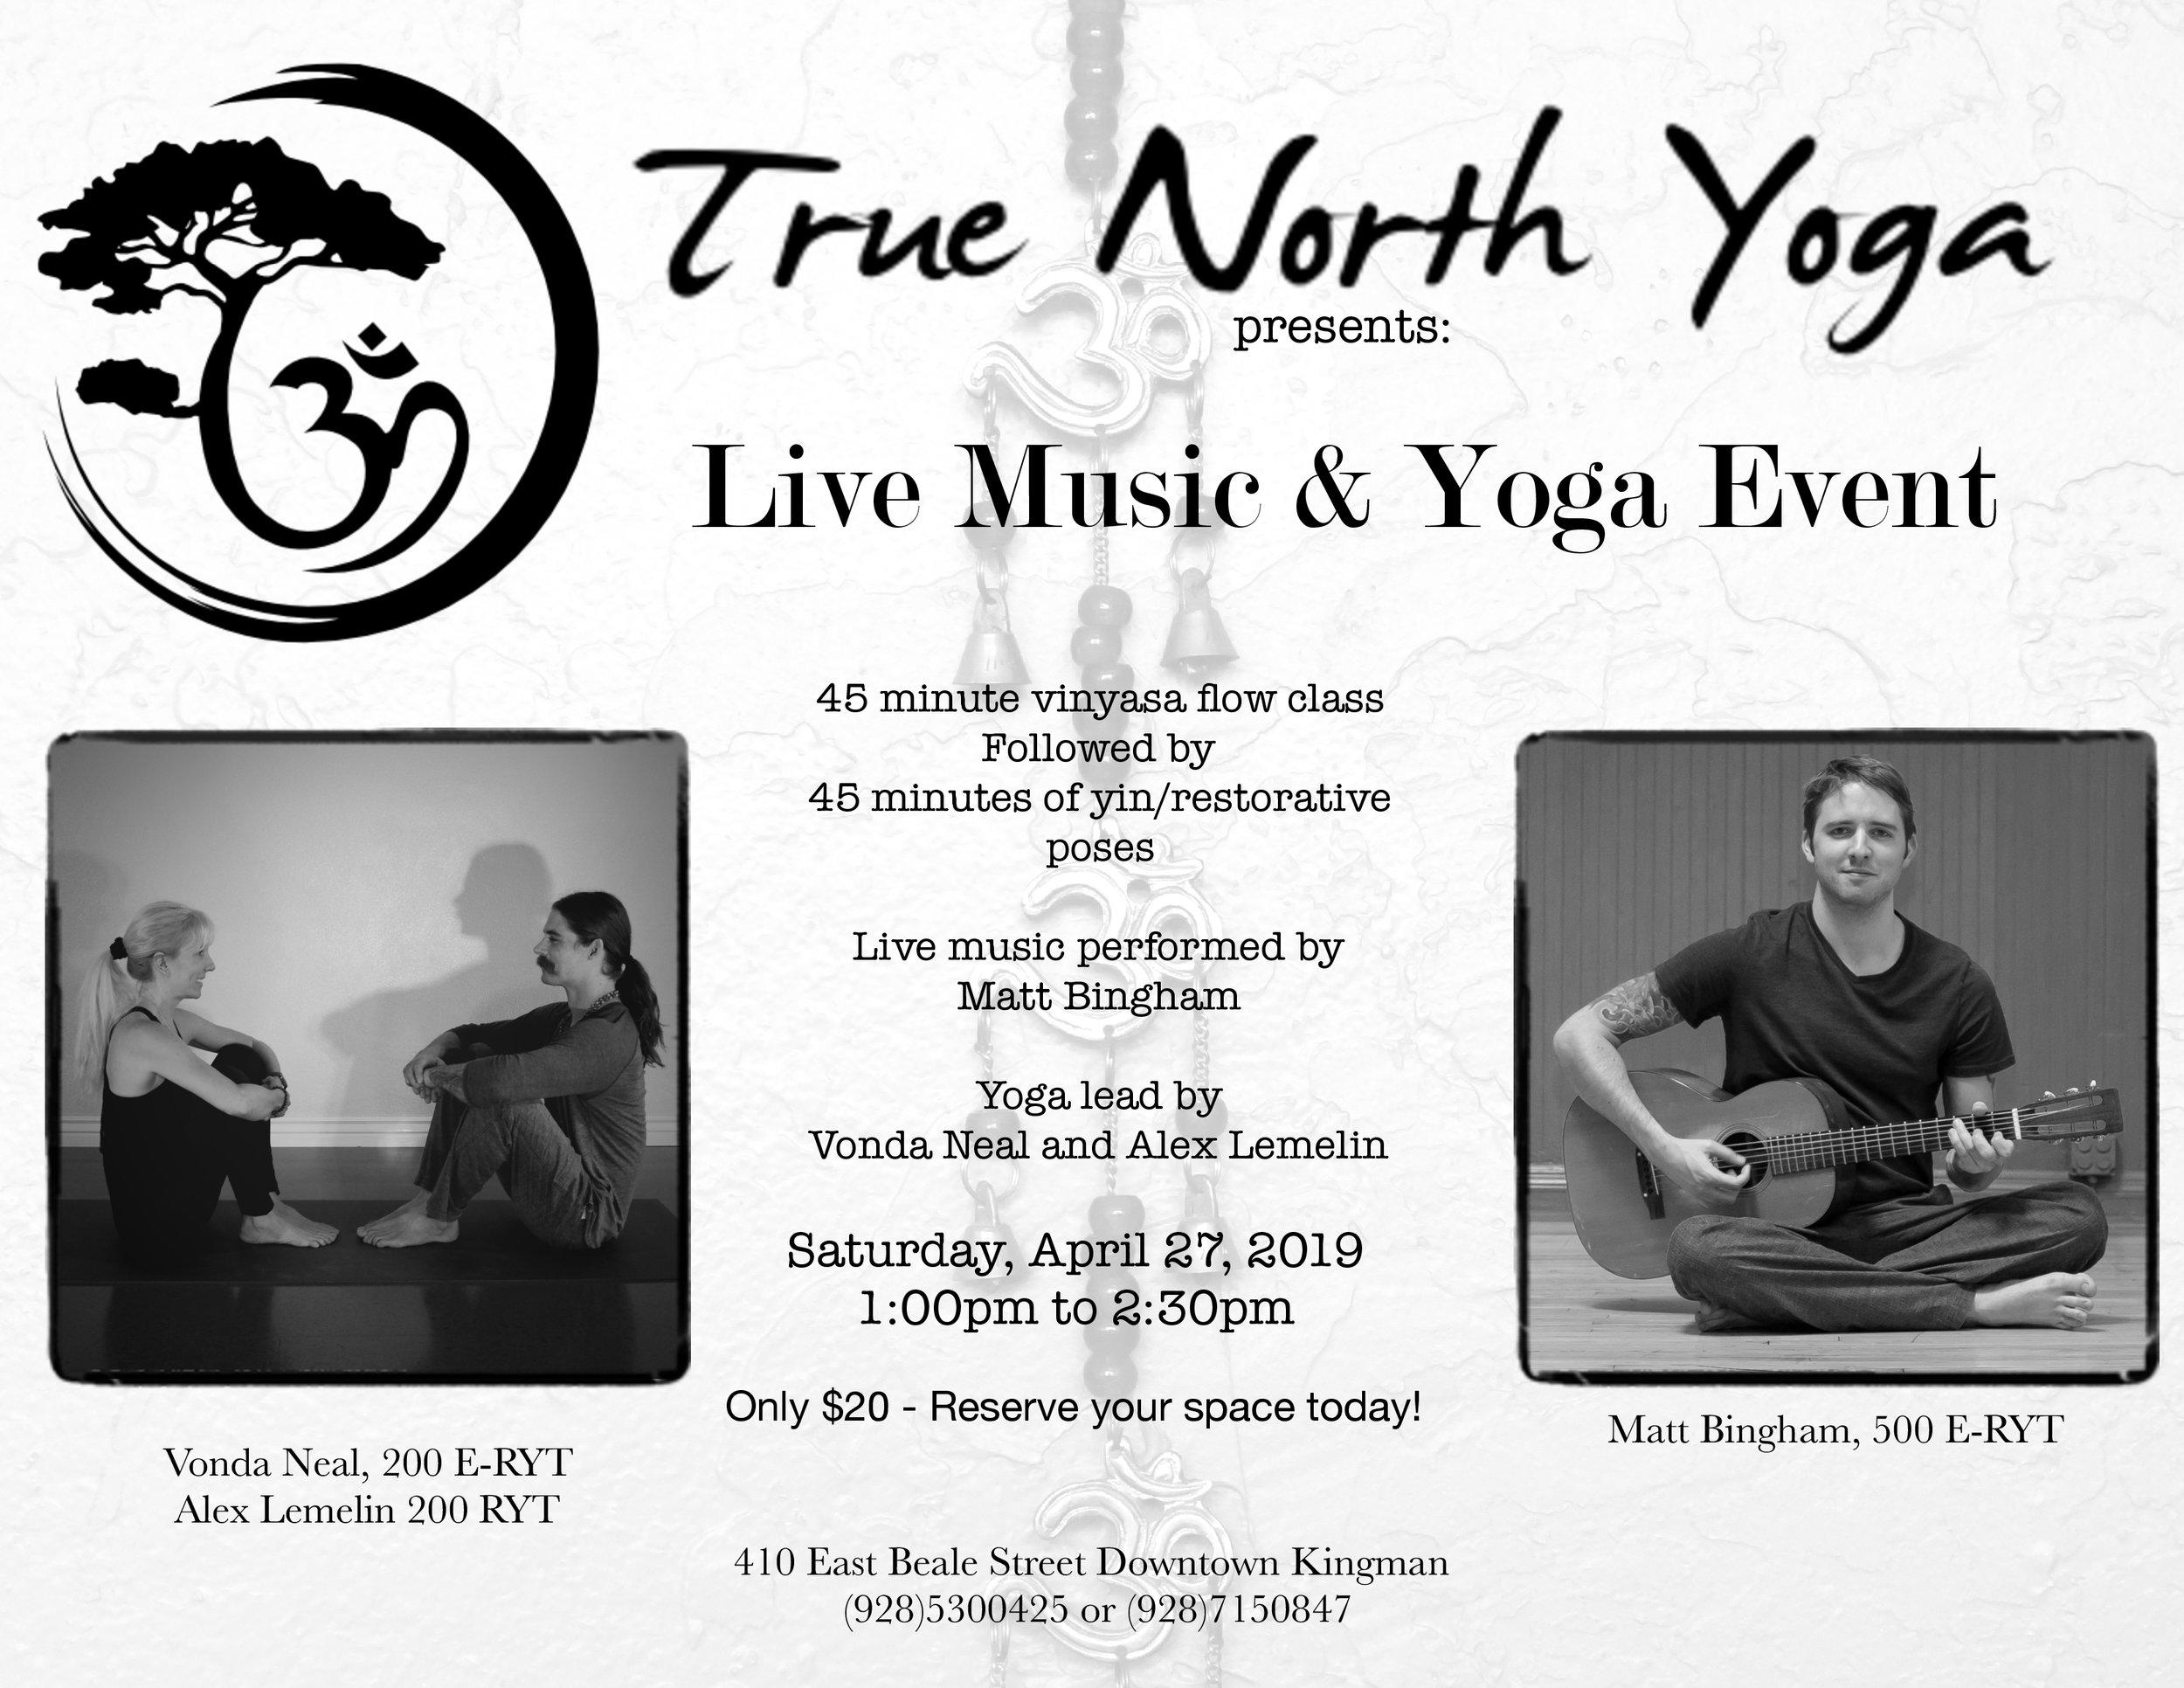 TNY Live Music & Yoga Event.jpg